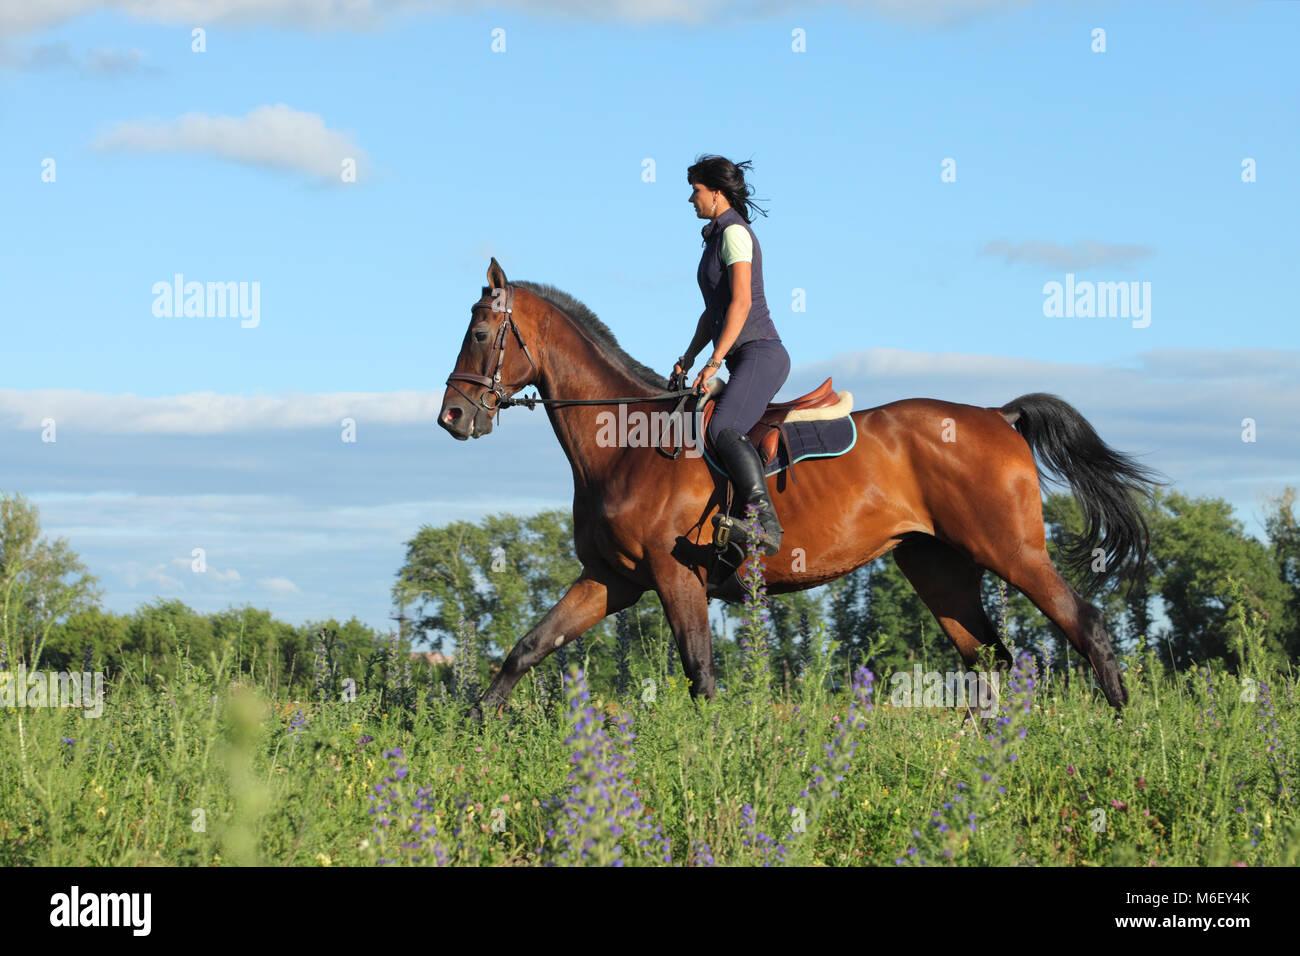 Cheval au galop avec femelle rider Photo Stock